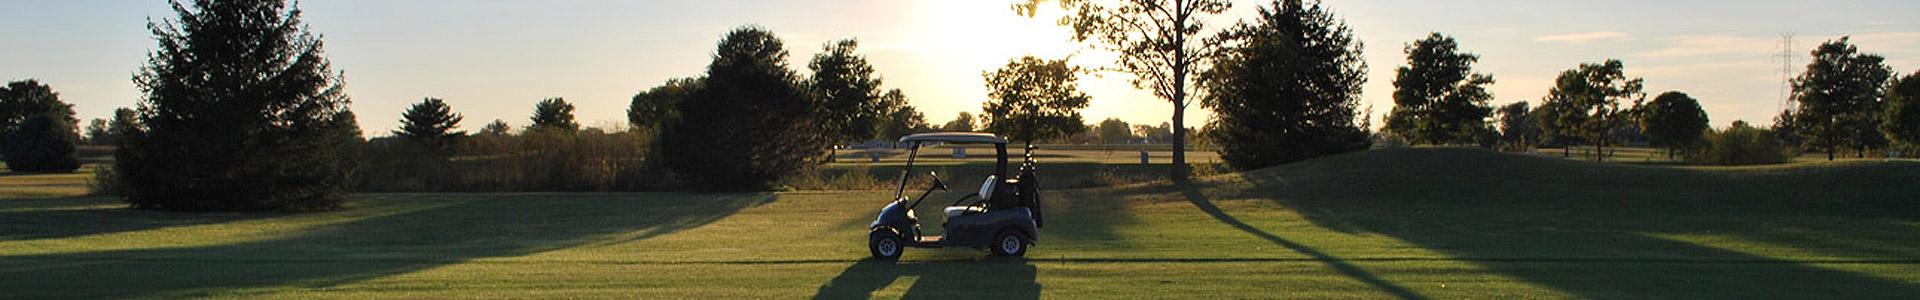 Memberships - The Legends Golf Club